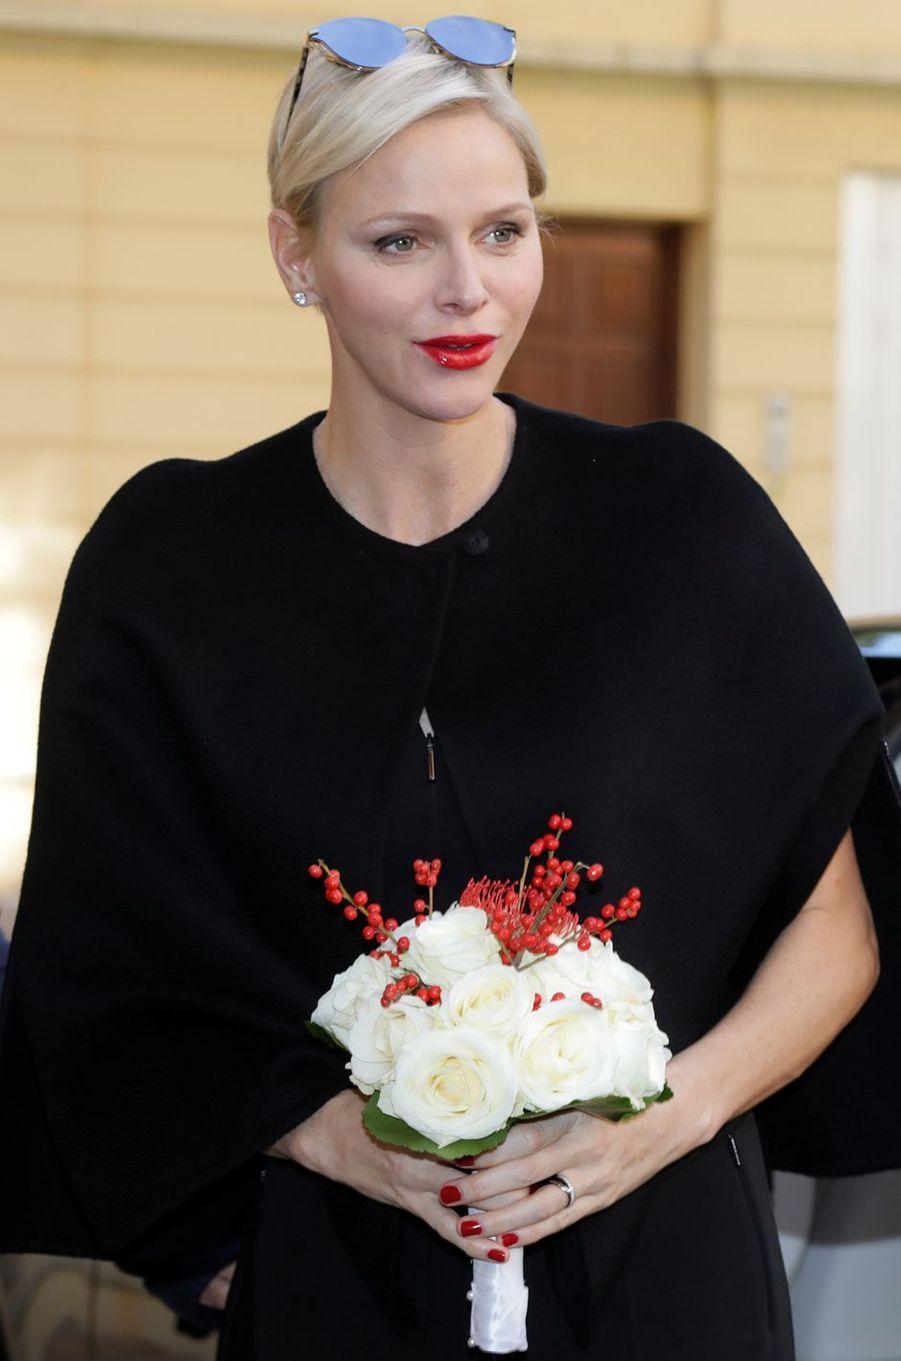 La princesse Charlène de Monaco, à Monaco le 17 novembre 2017